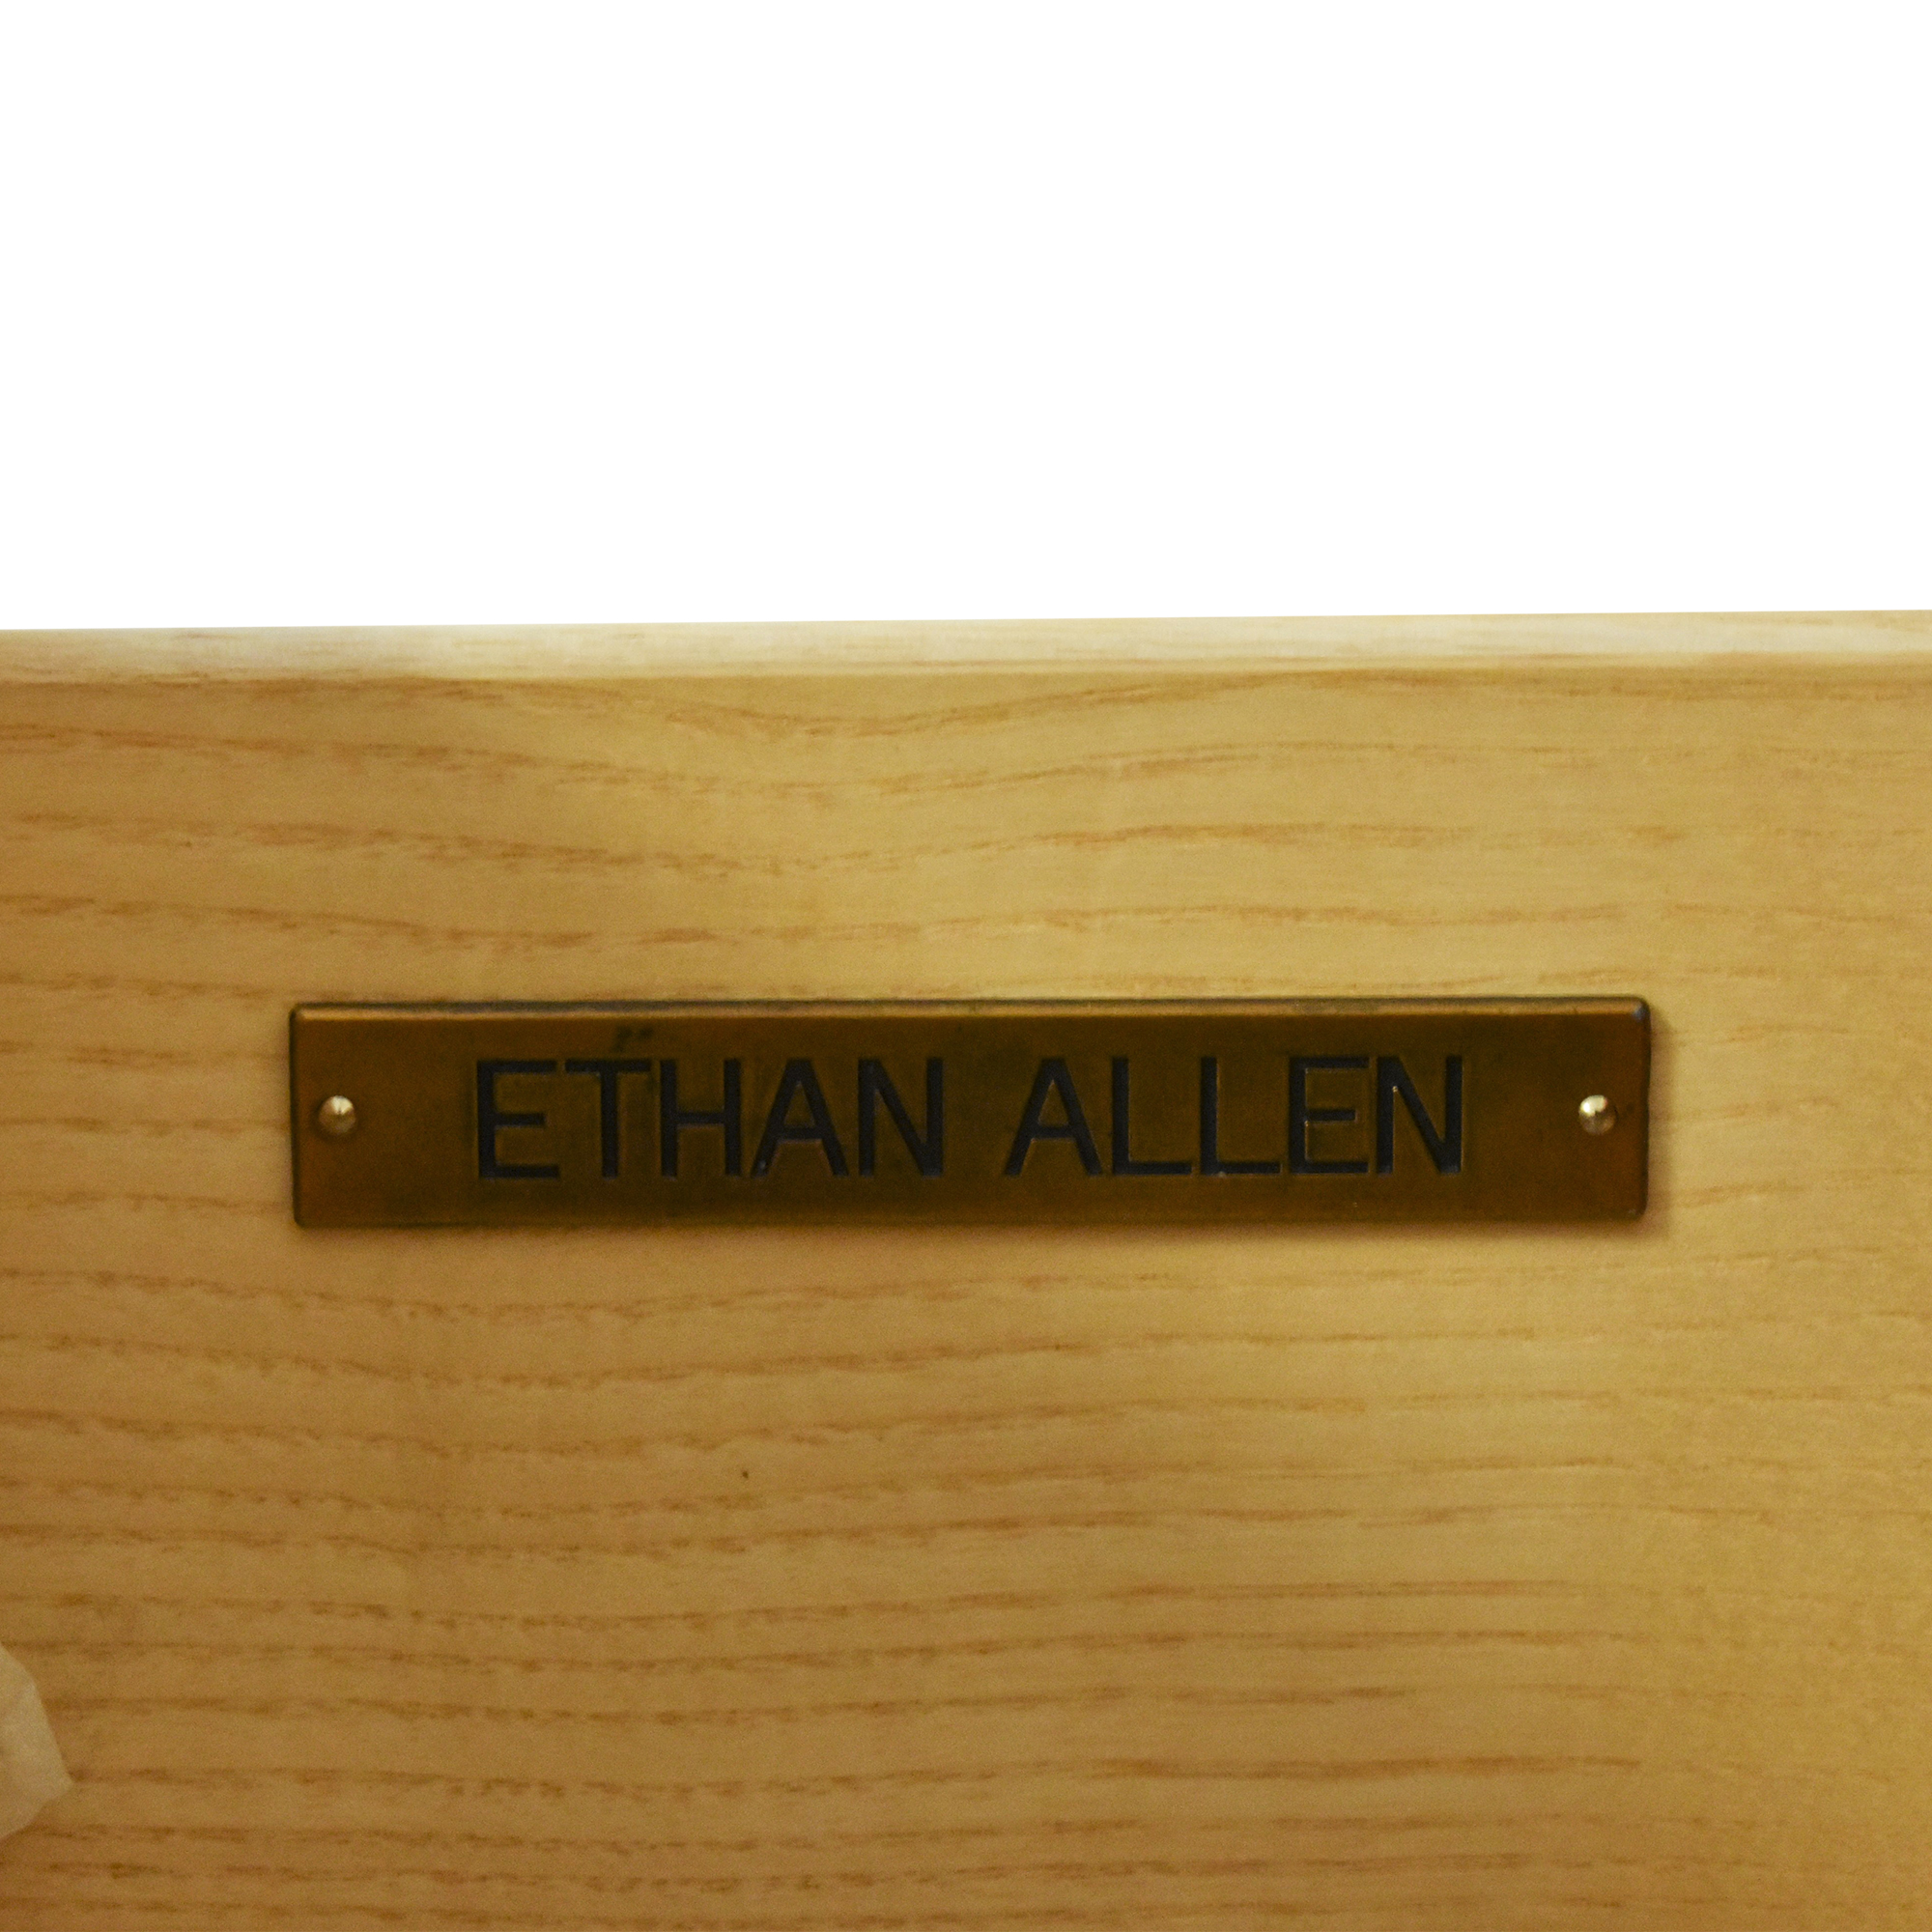 Ethan Allen Ethan Allen Double Dresser nj